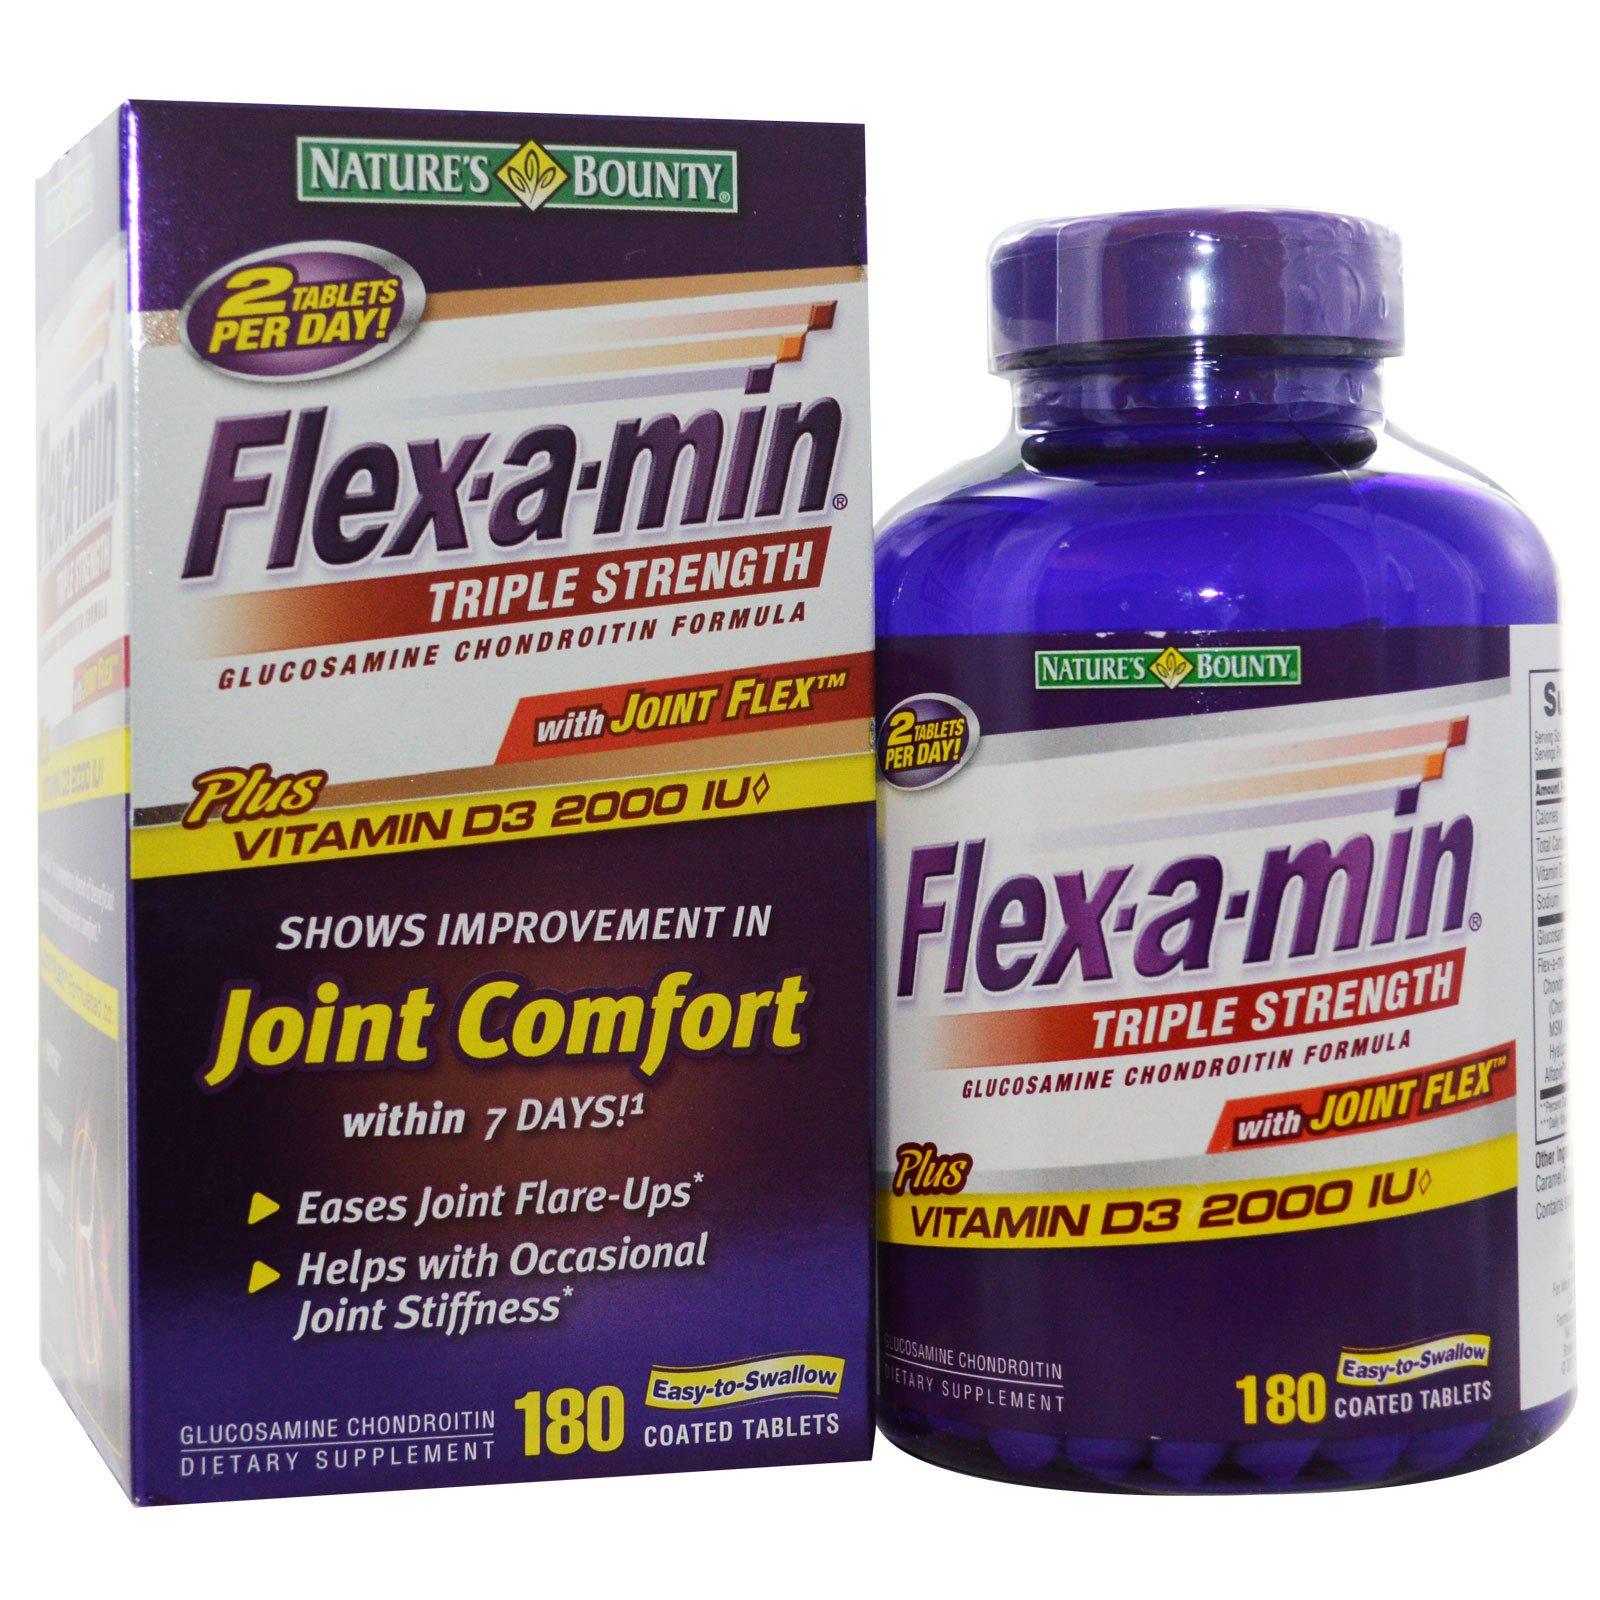 Flex-a-min triple strength